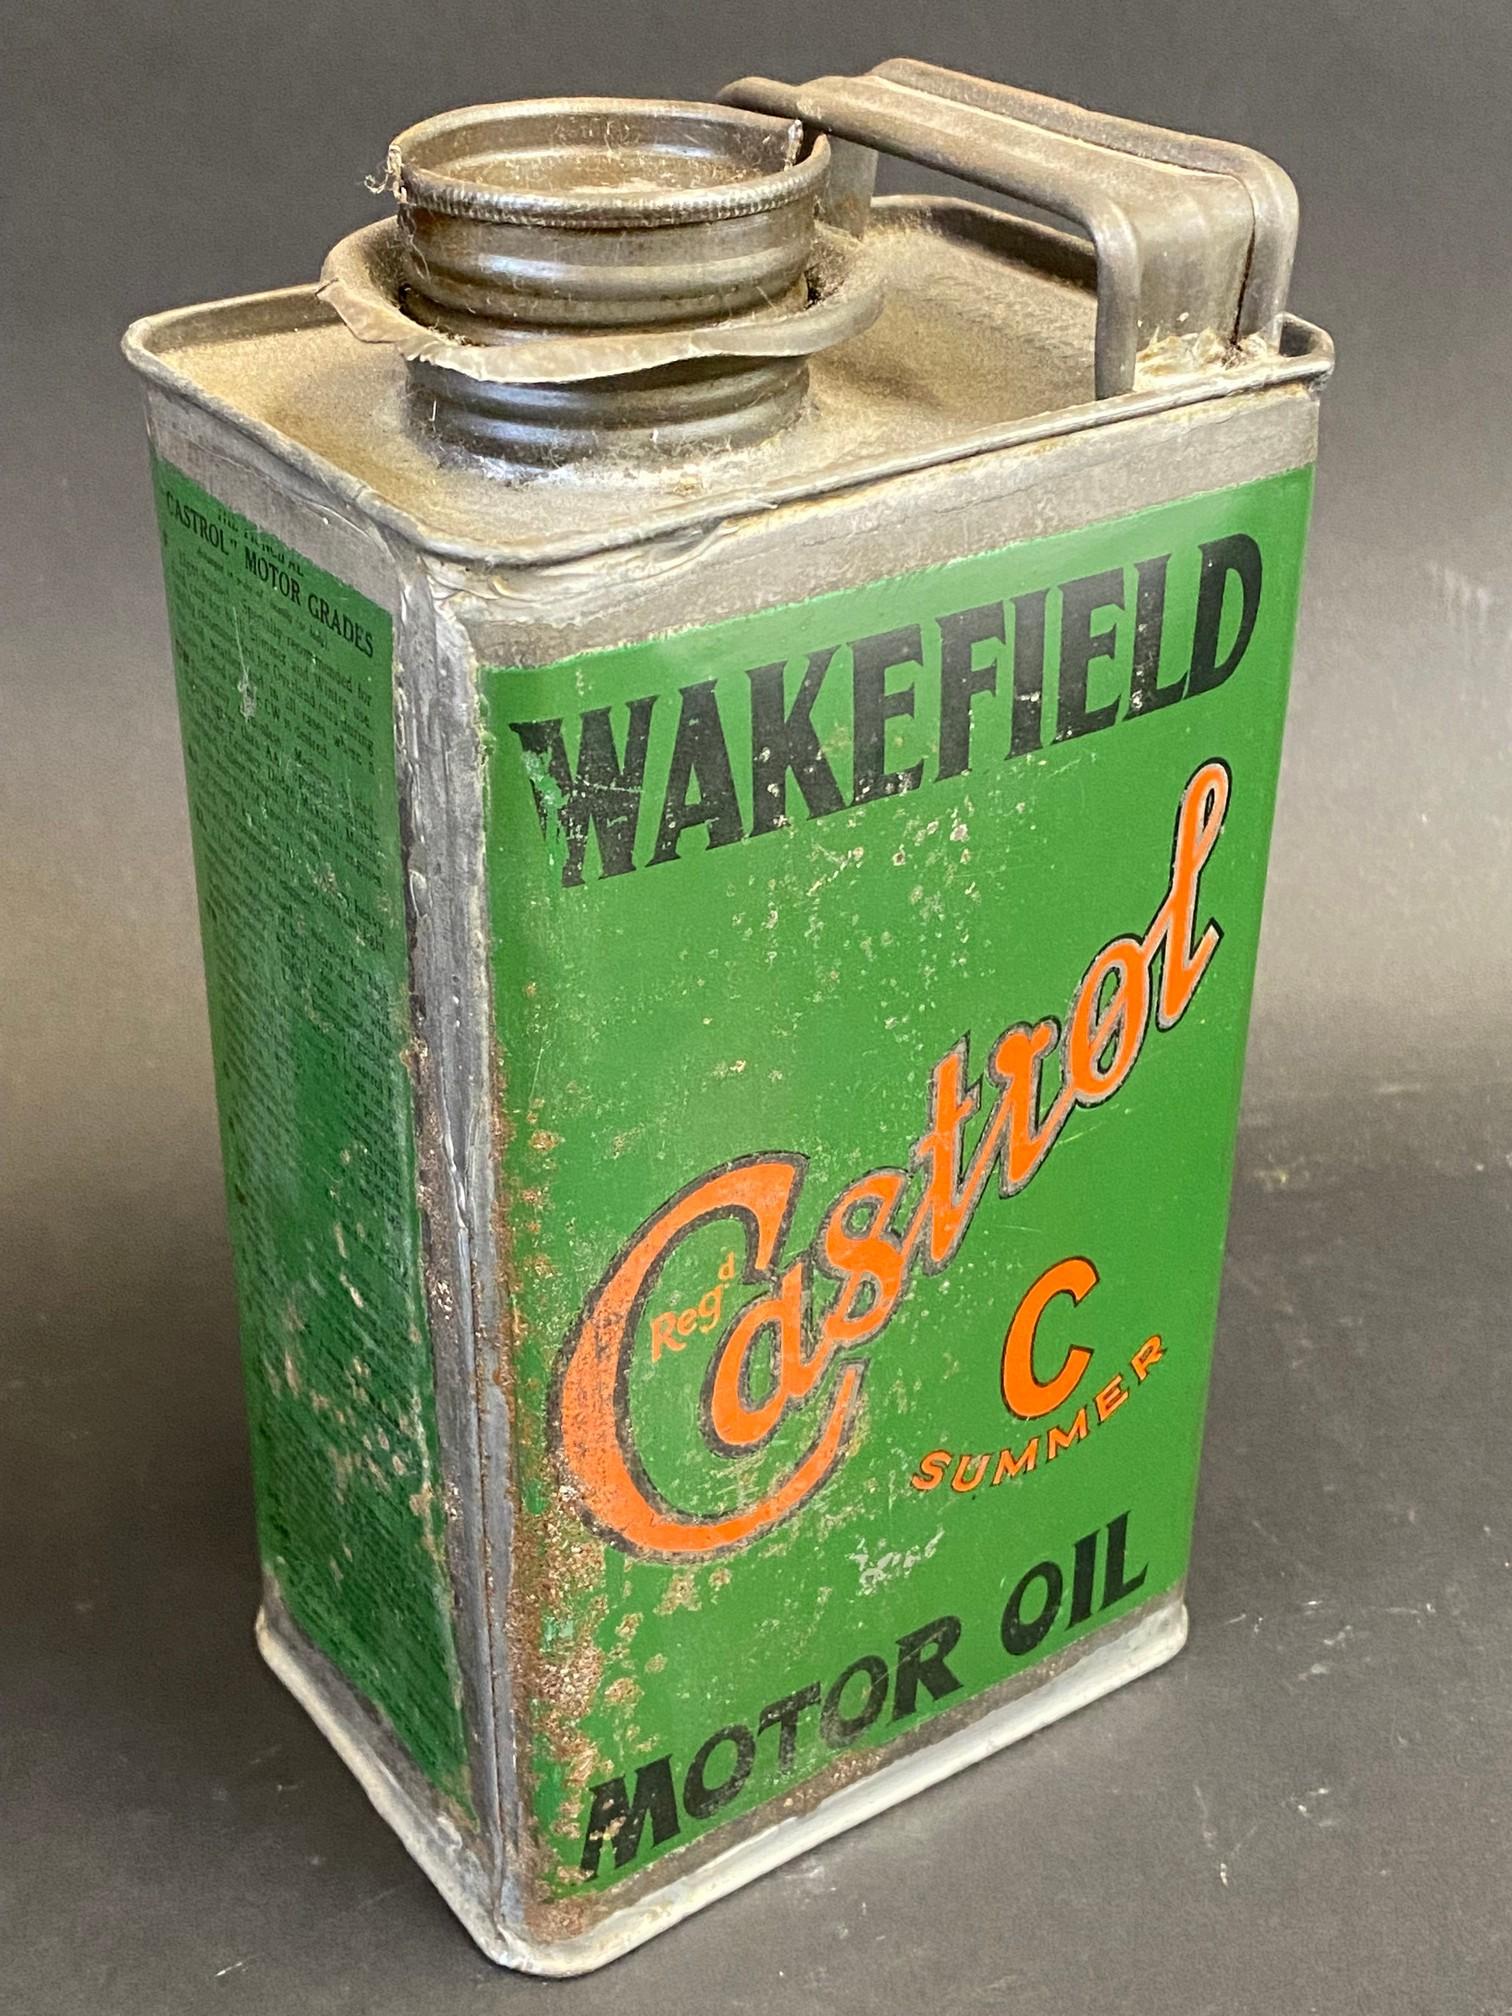 A Wakefield Castrol Motor Oil 'C Summer' grade rectangular quart can.